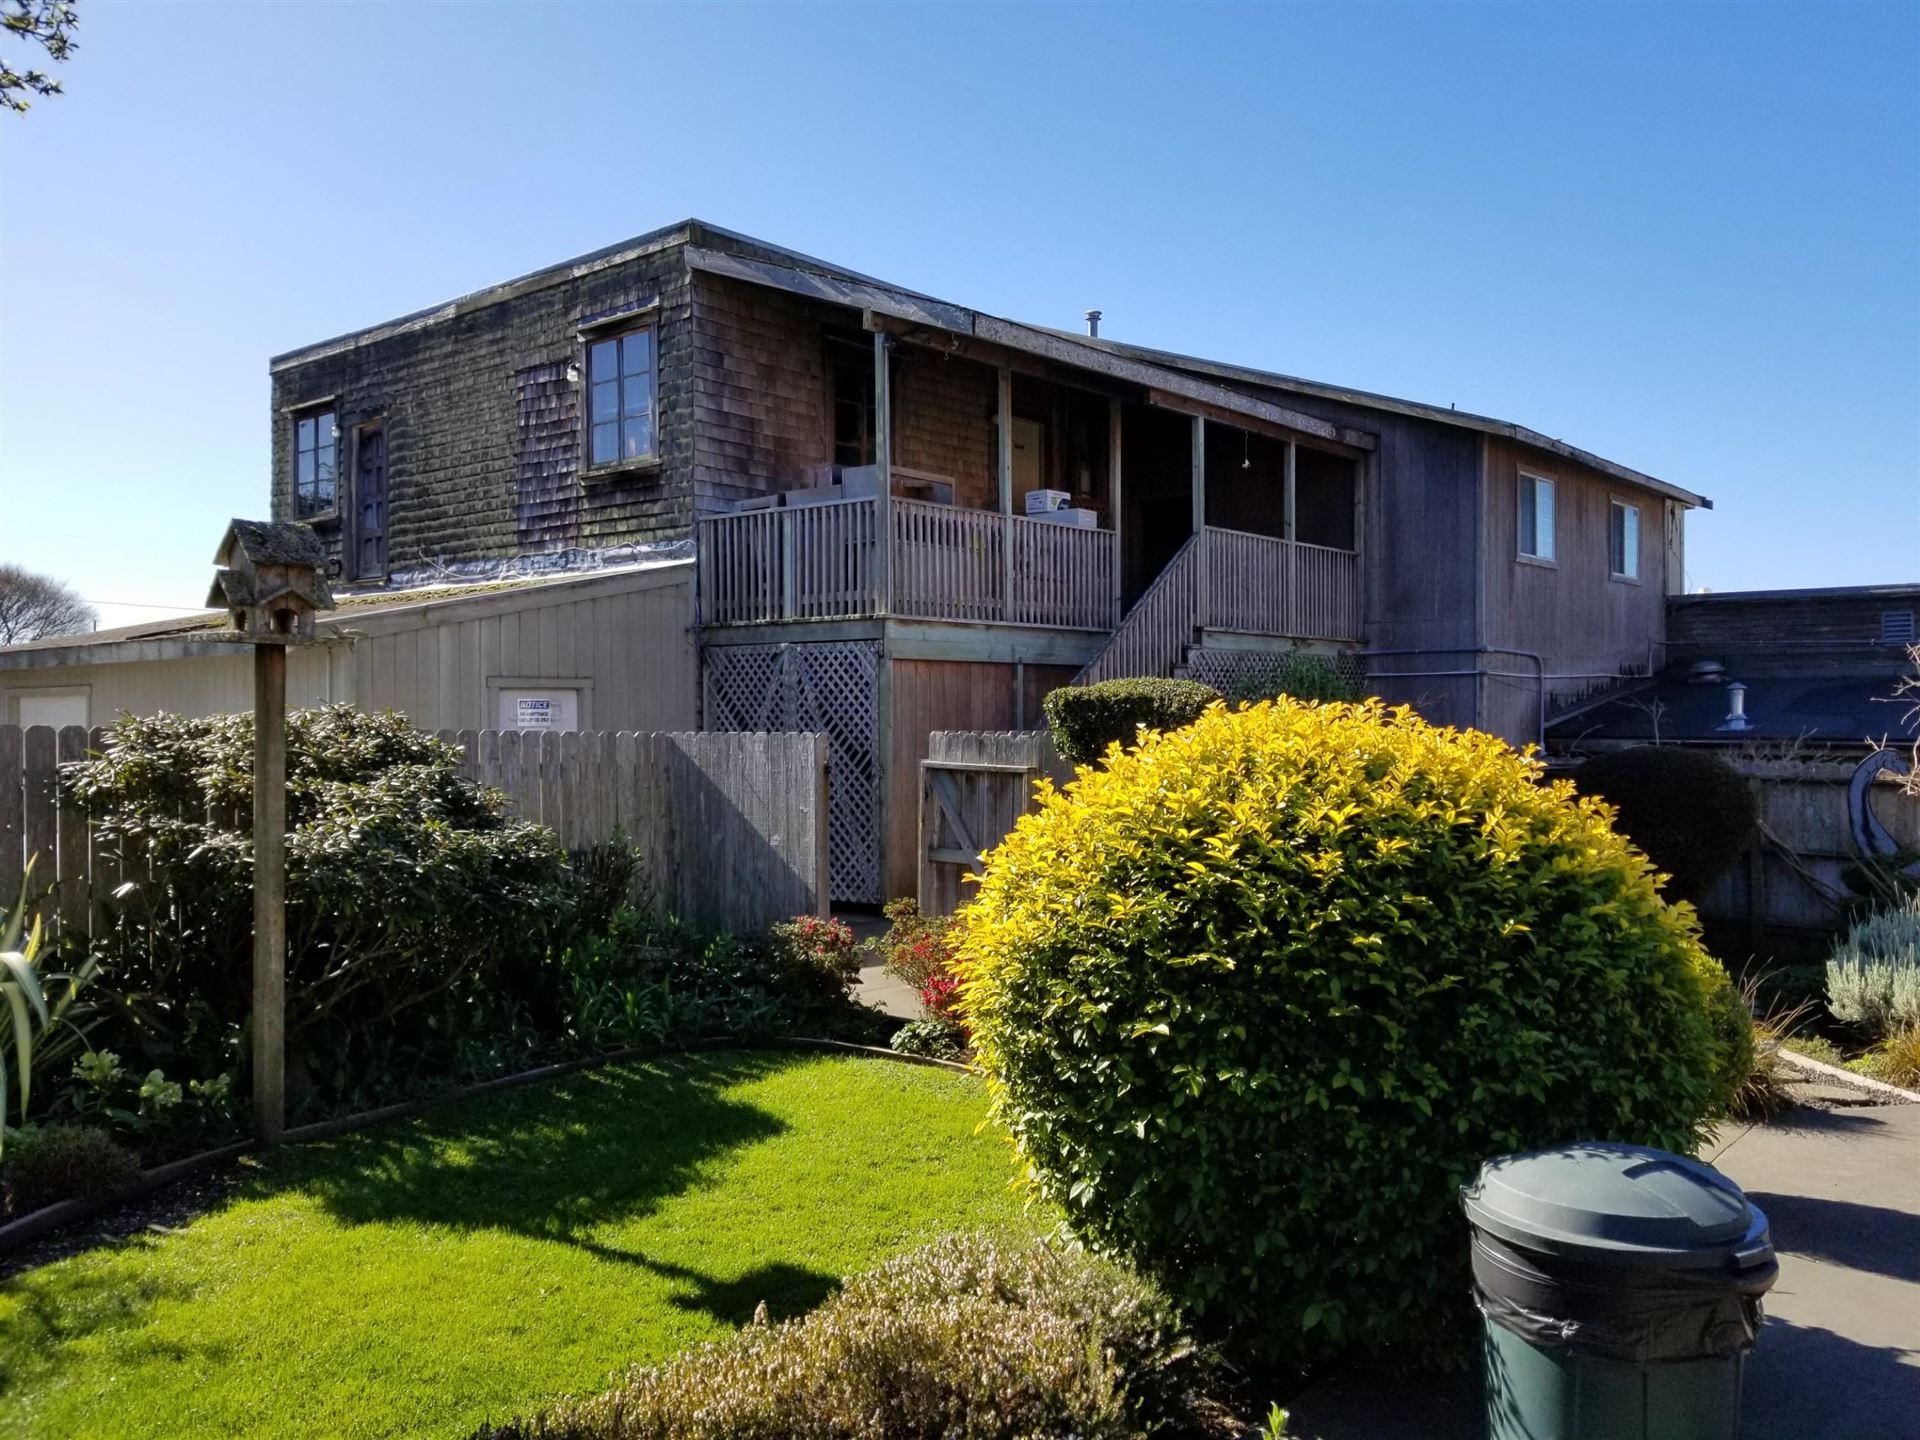 282 Loleta Drive, Loleta, CA 95551 - MLS#: 257401